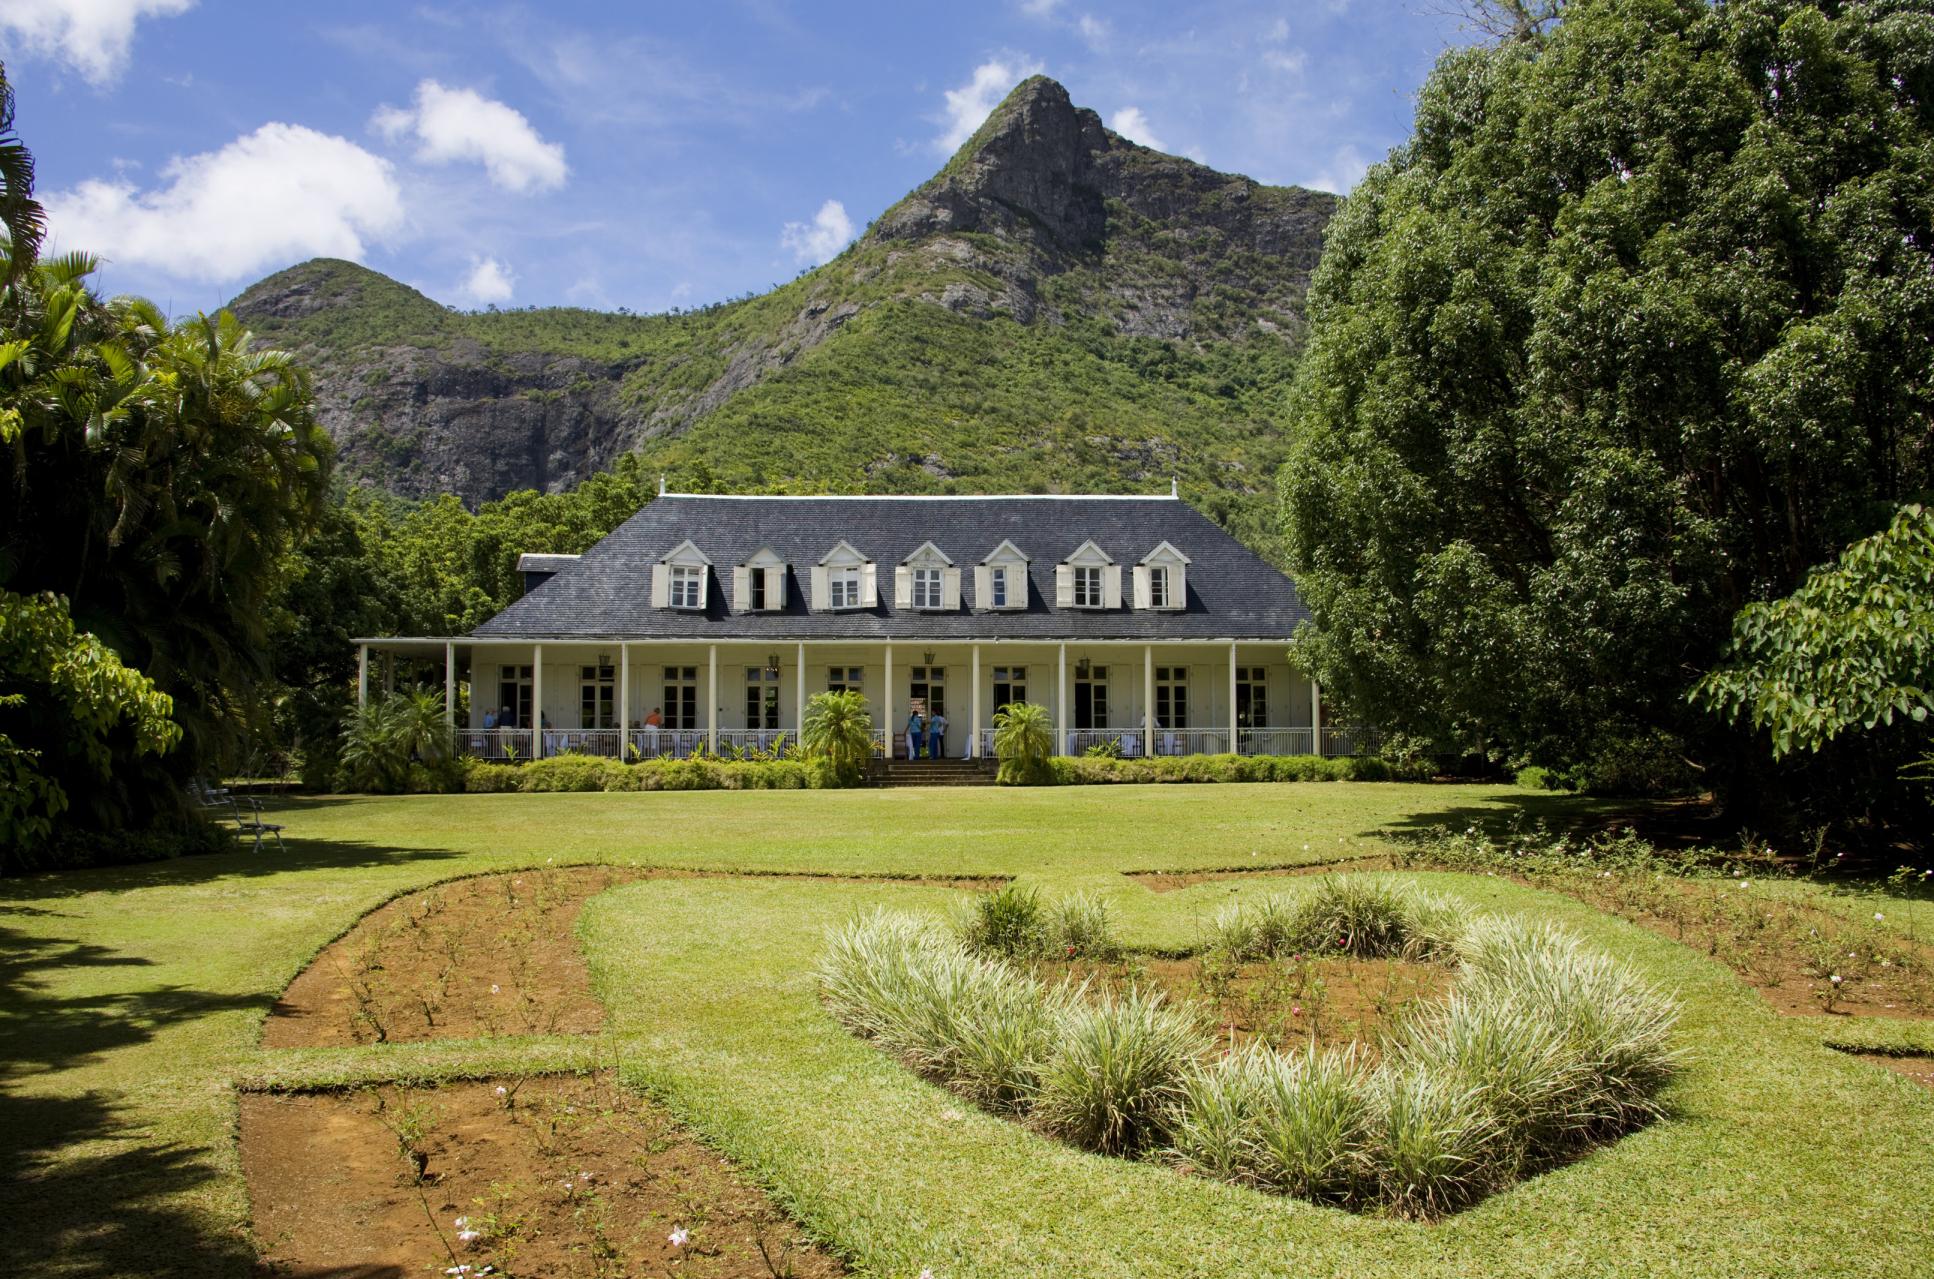 Eureka | Moka, Mauritius Attractions - Lonely Planet